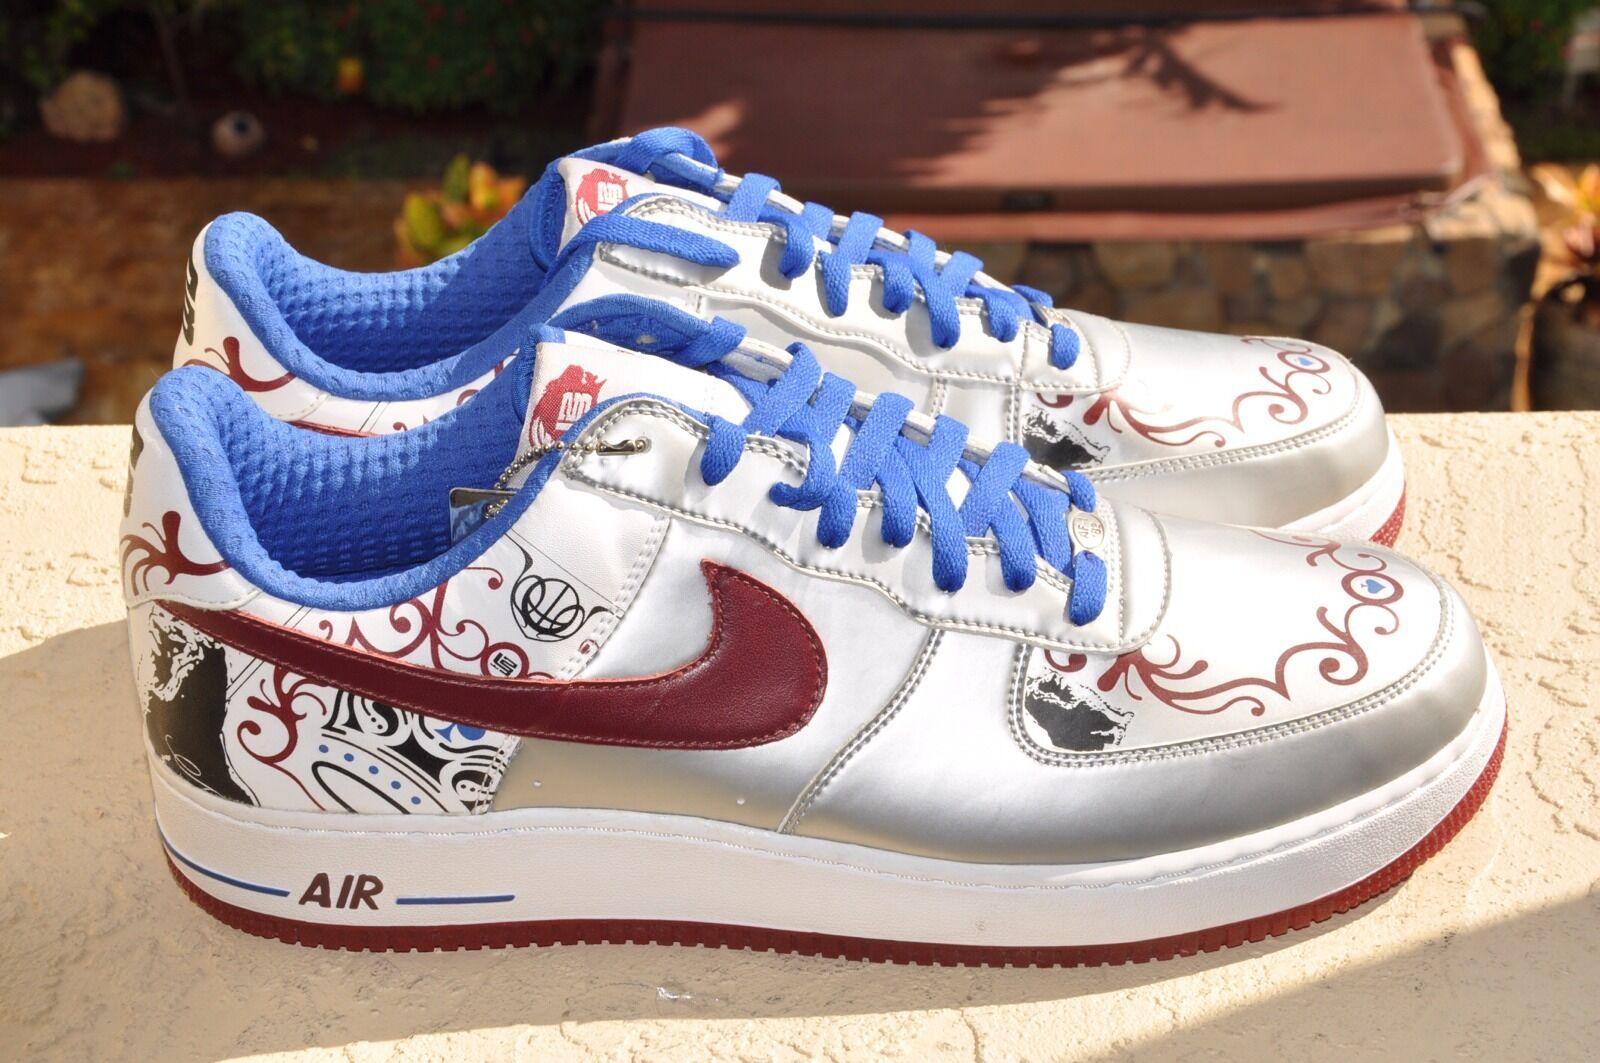 Nike air force 1 premio lebron james royal flush ds numero 14